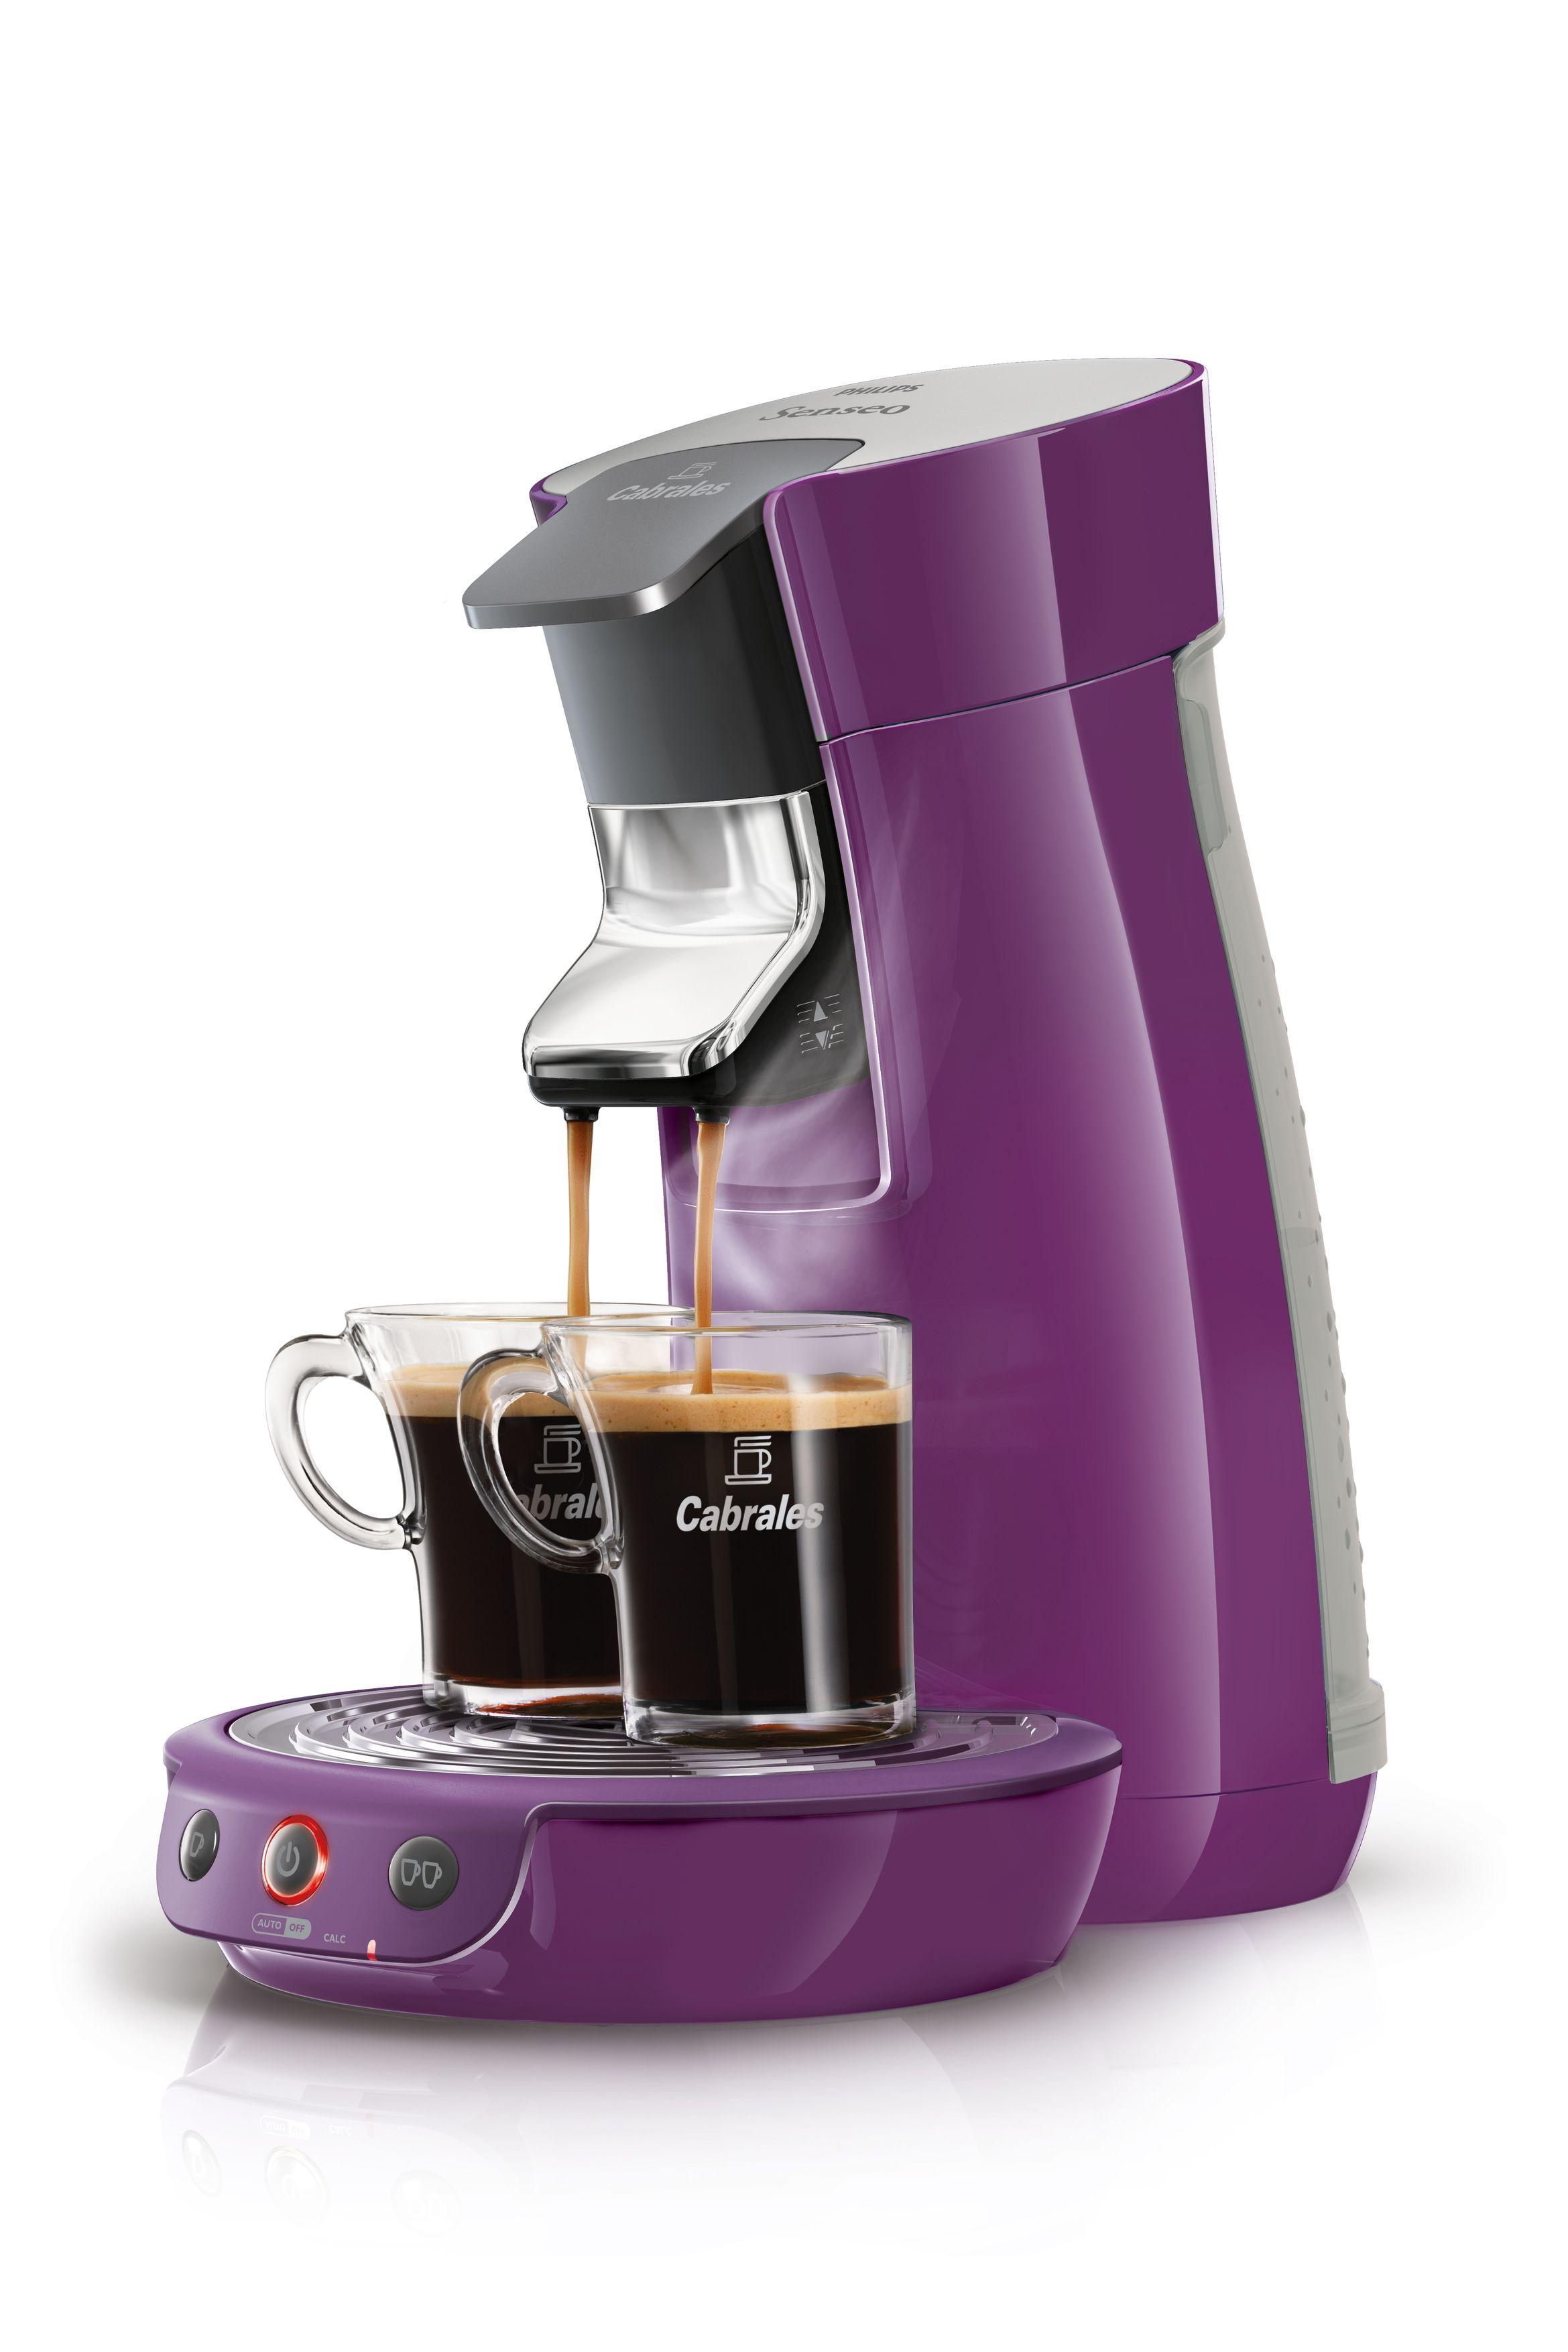 Philips Senseo Viva Cafe Http Www Philipssenseo Com Ar Https Www Facebook Com Philipssenseoargentin Purple Kitchen Appliances Purple Home Purple Kitchen